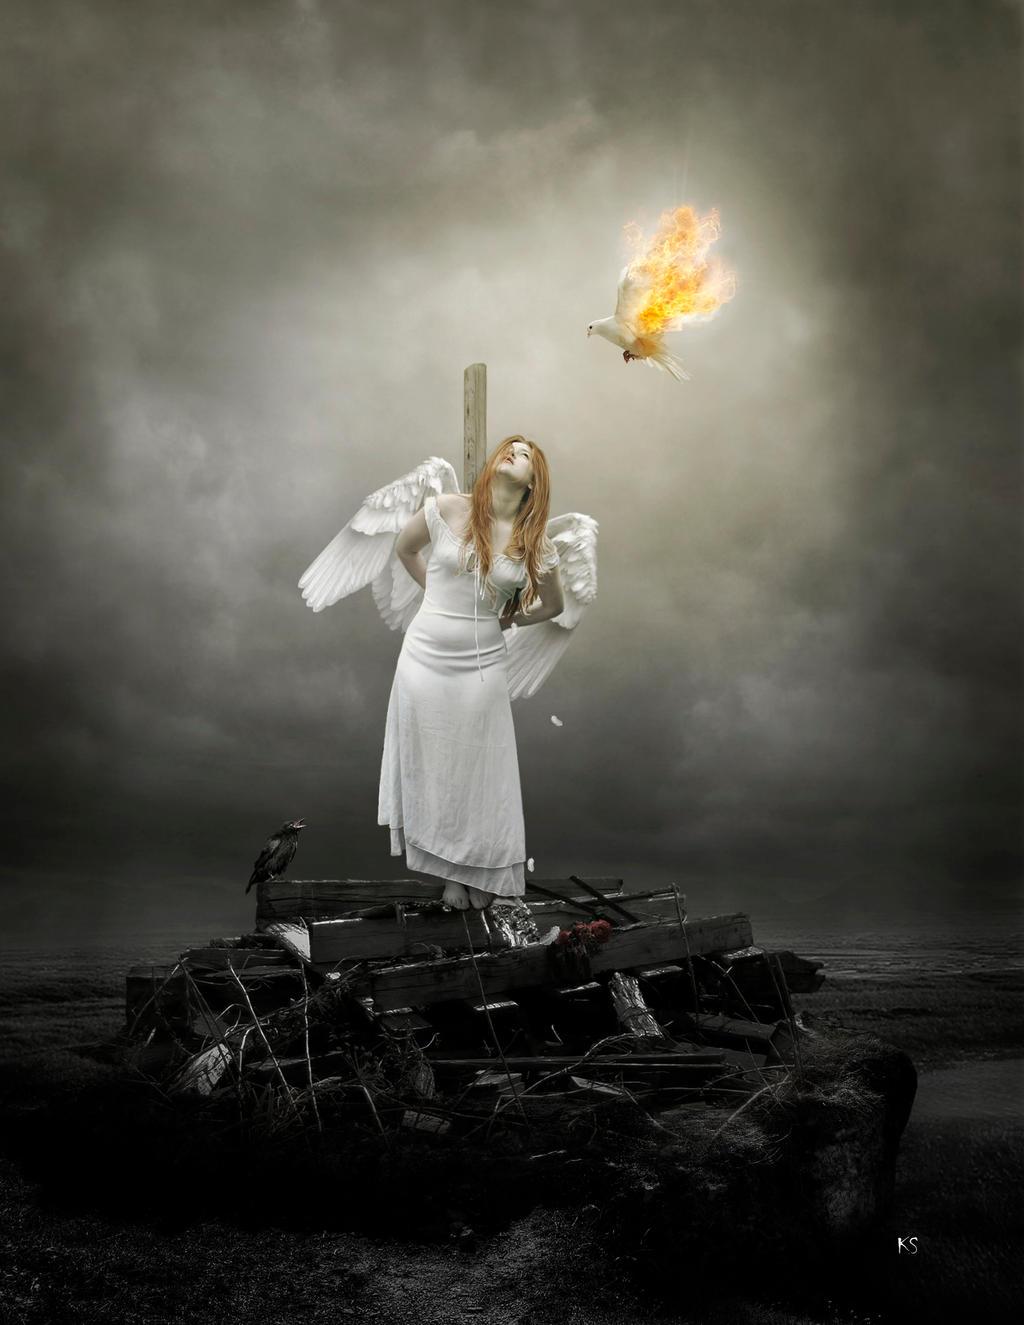 Angel by Silvia15